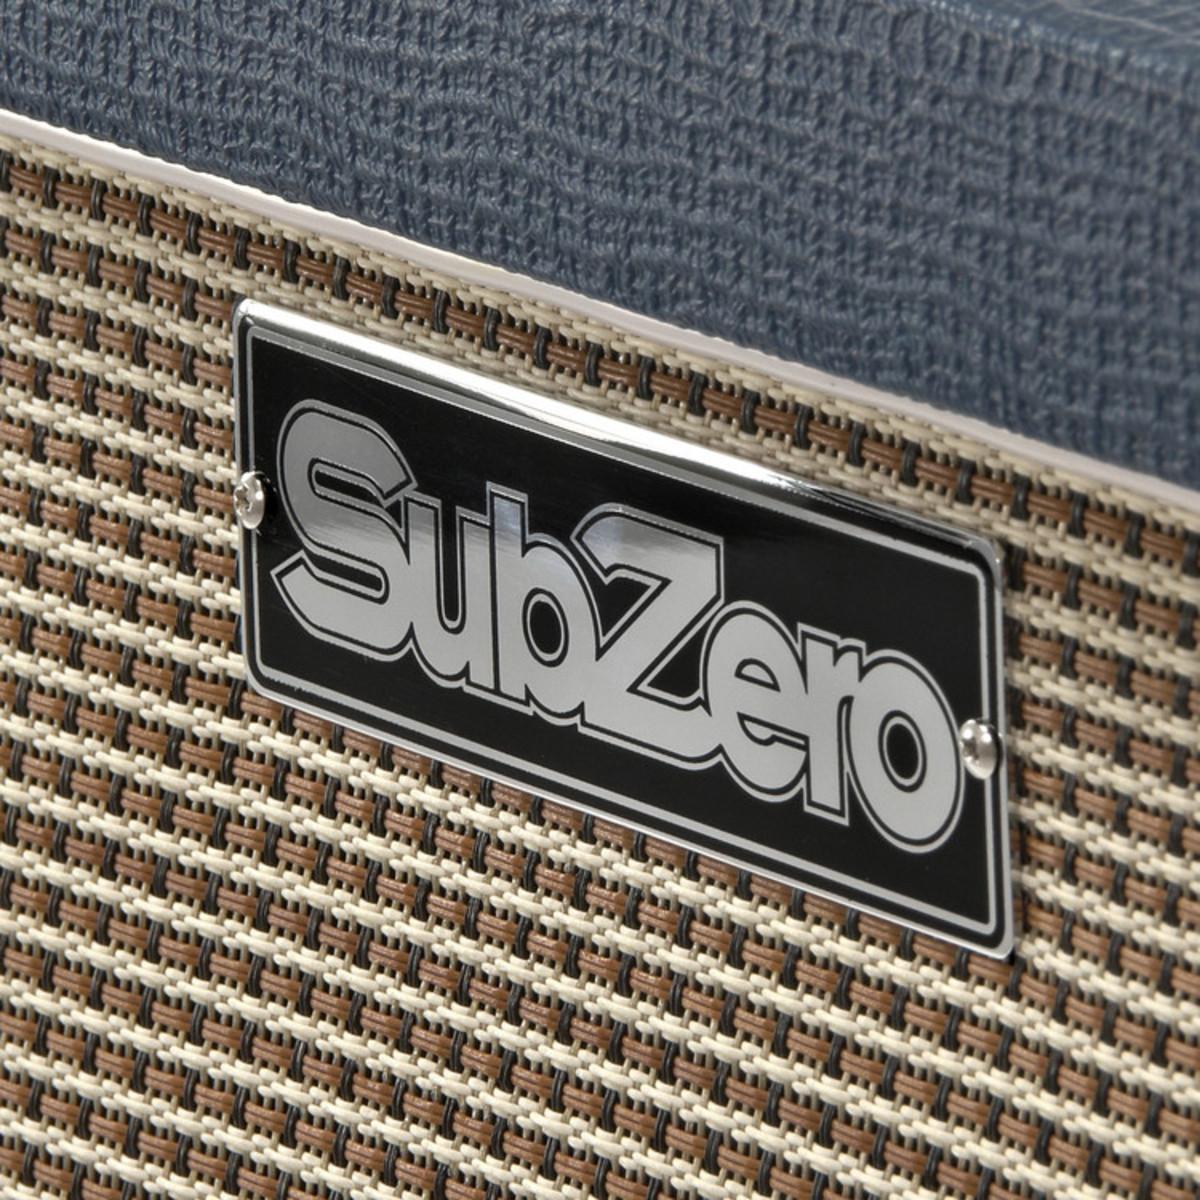 subzero g410 pantalla celestion 4 x 10 b stock gear4music. Black Bedroom Furniture Sets. Home Design Ideas